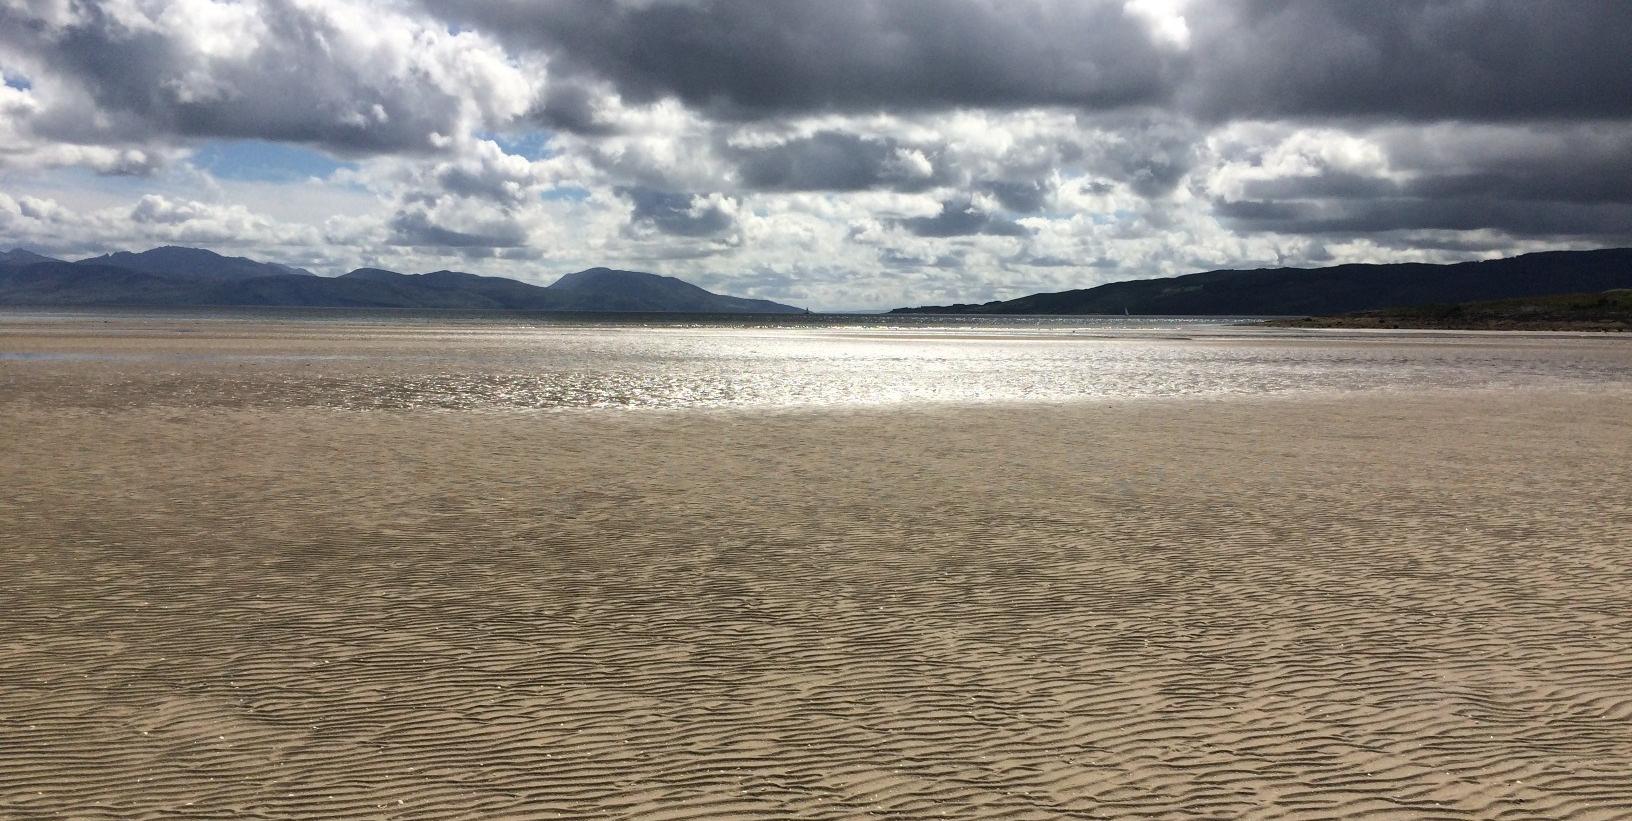 Bech in Argyll